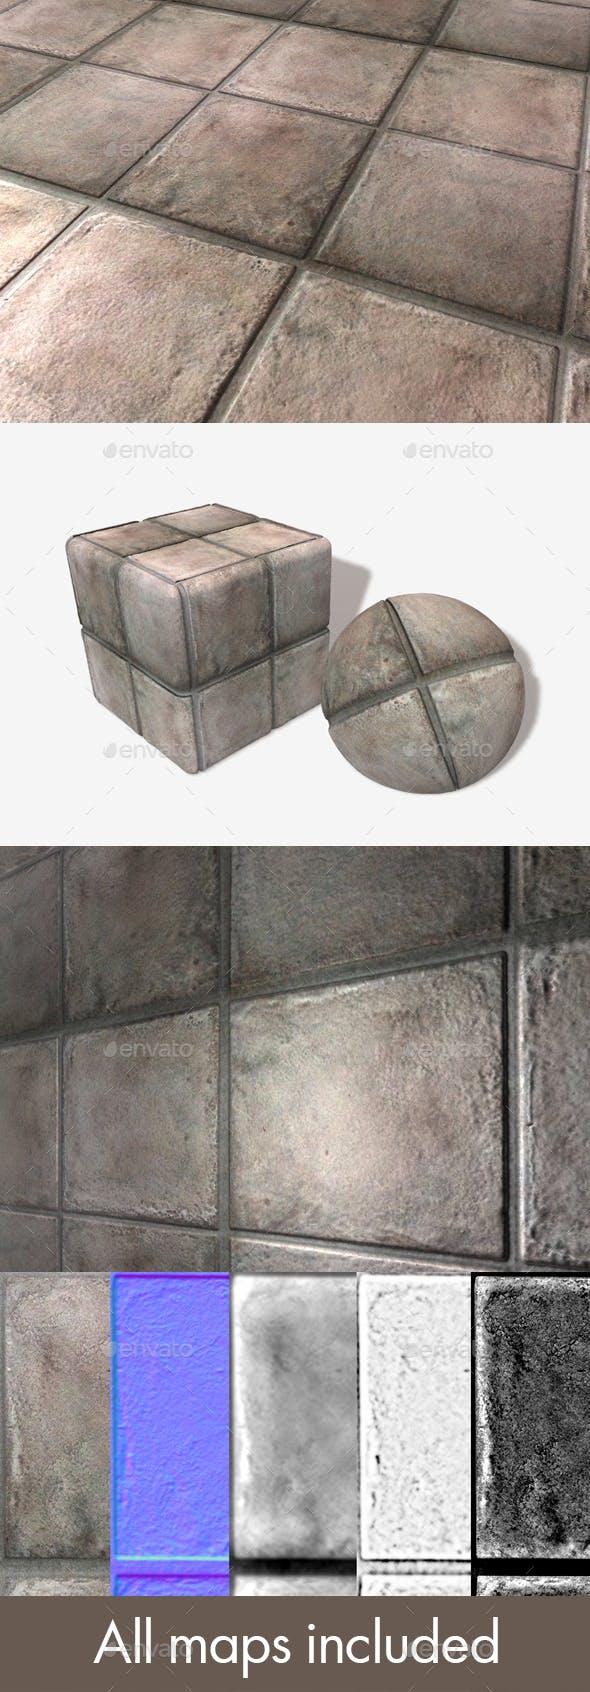 Floor Tiles Seamless Texture - 3DOcean Item for Sale